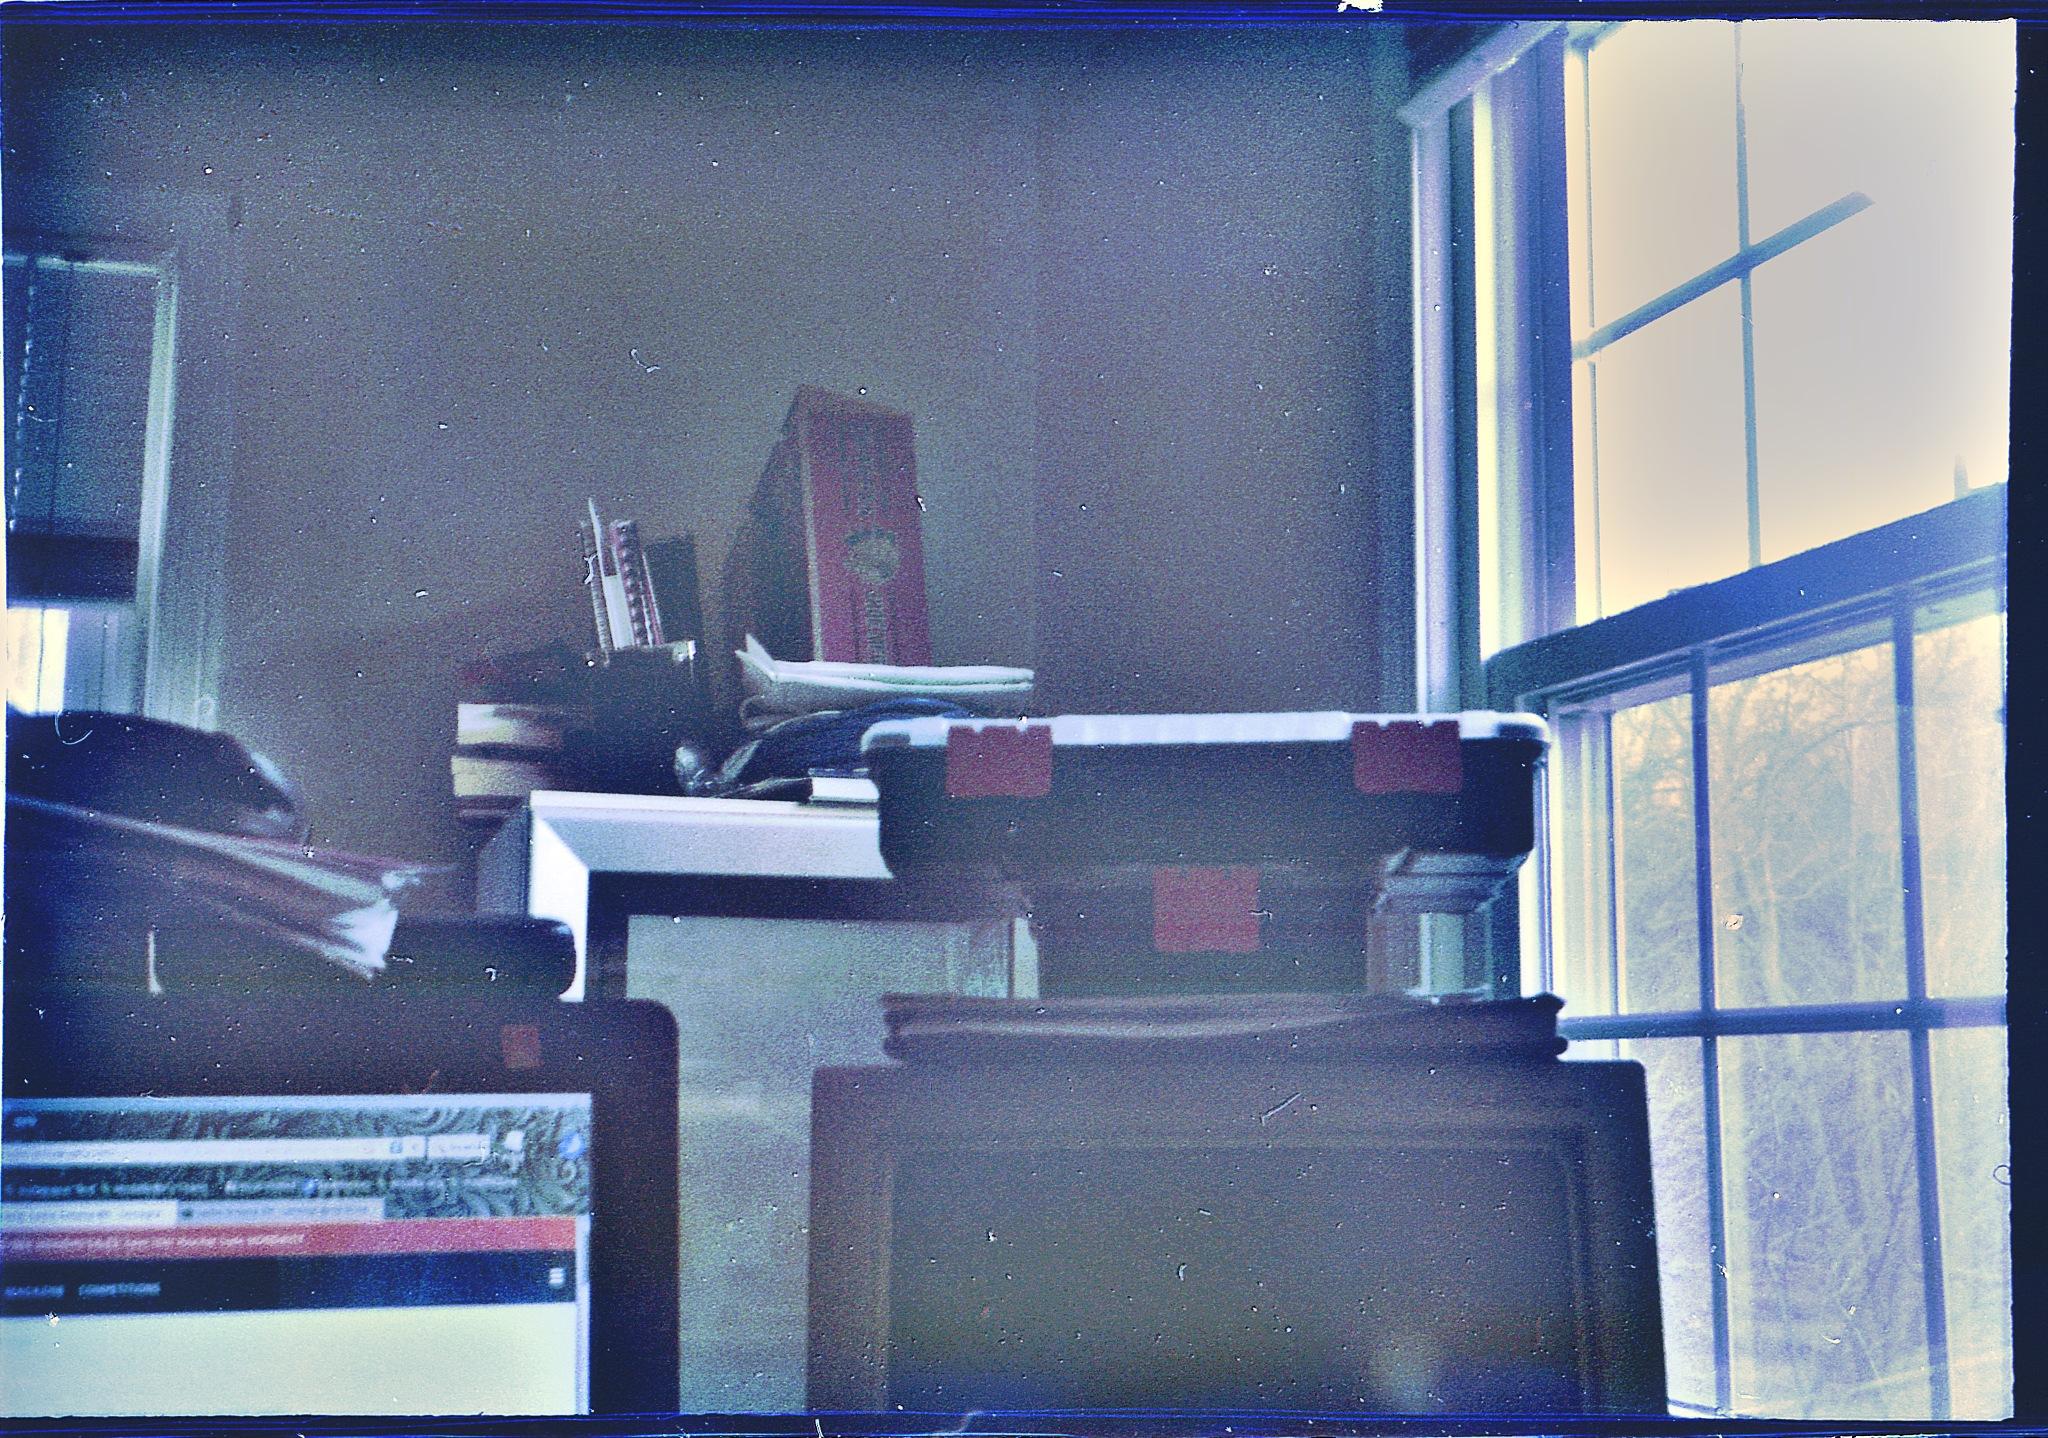 Smena 8m office by Helios Stardeath